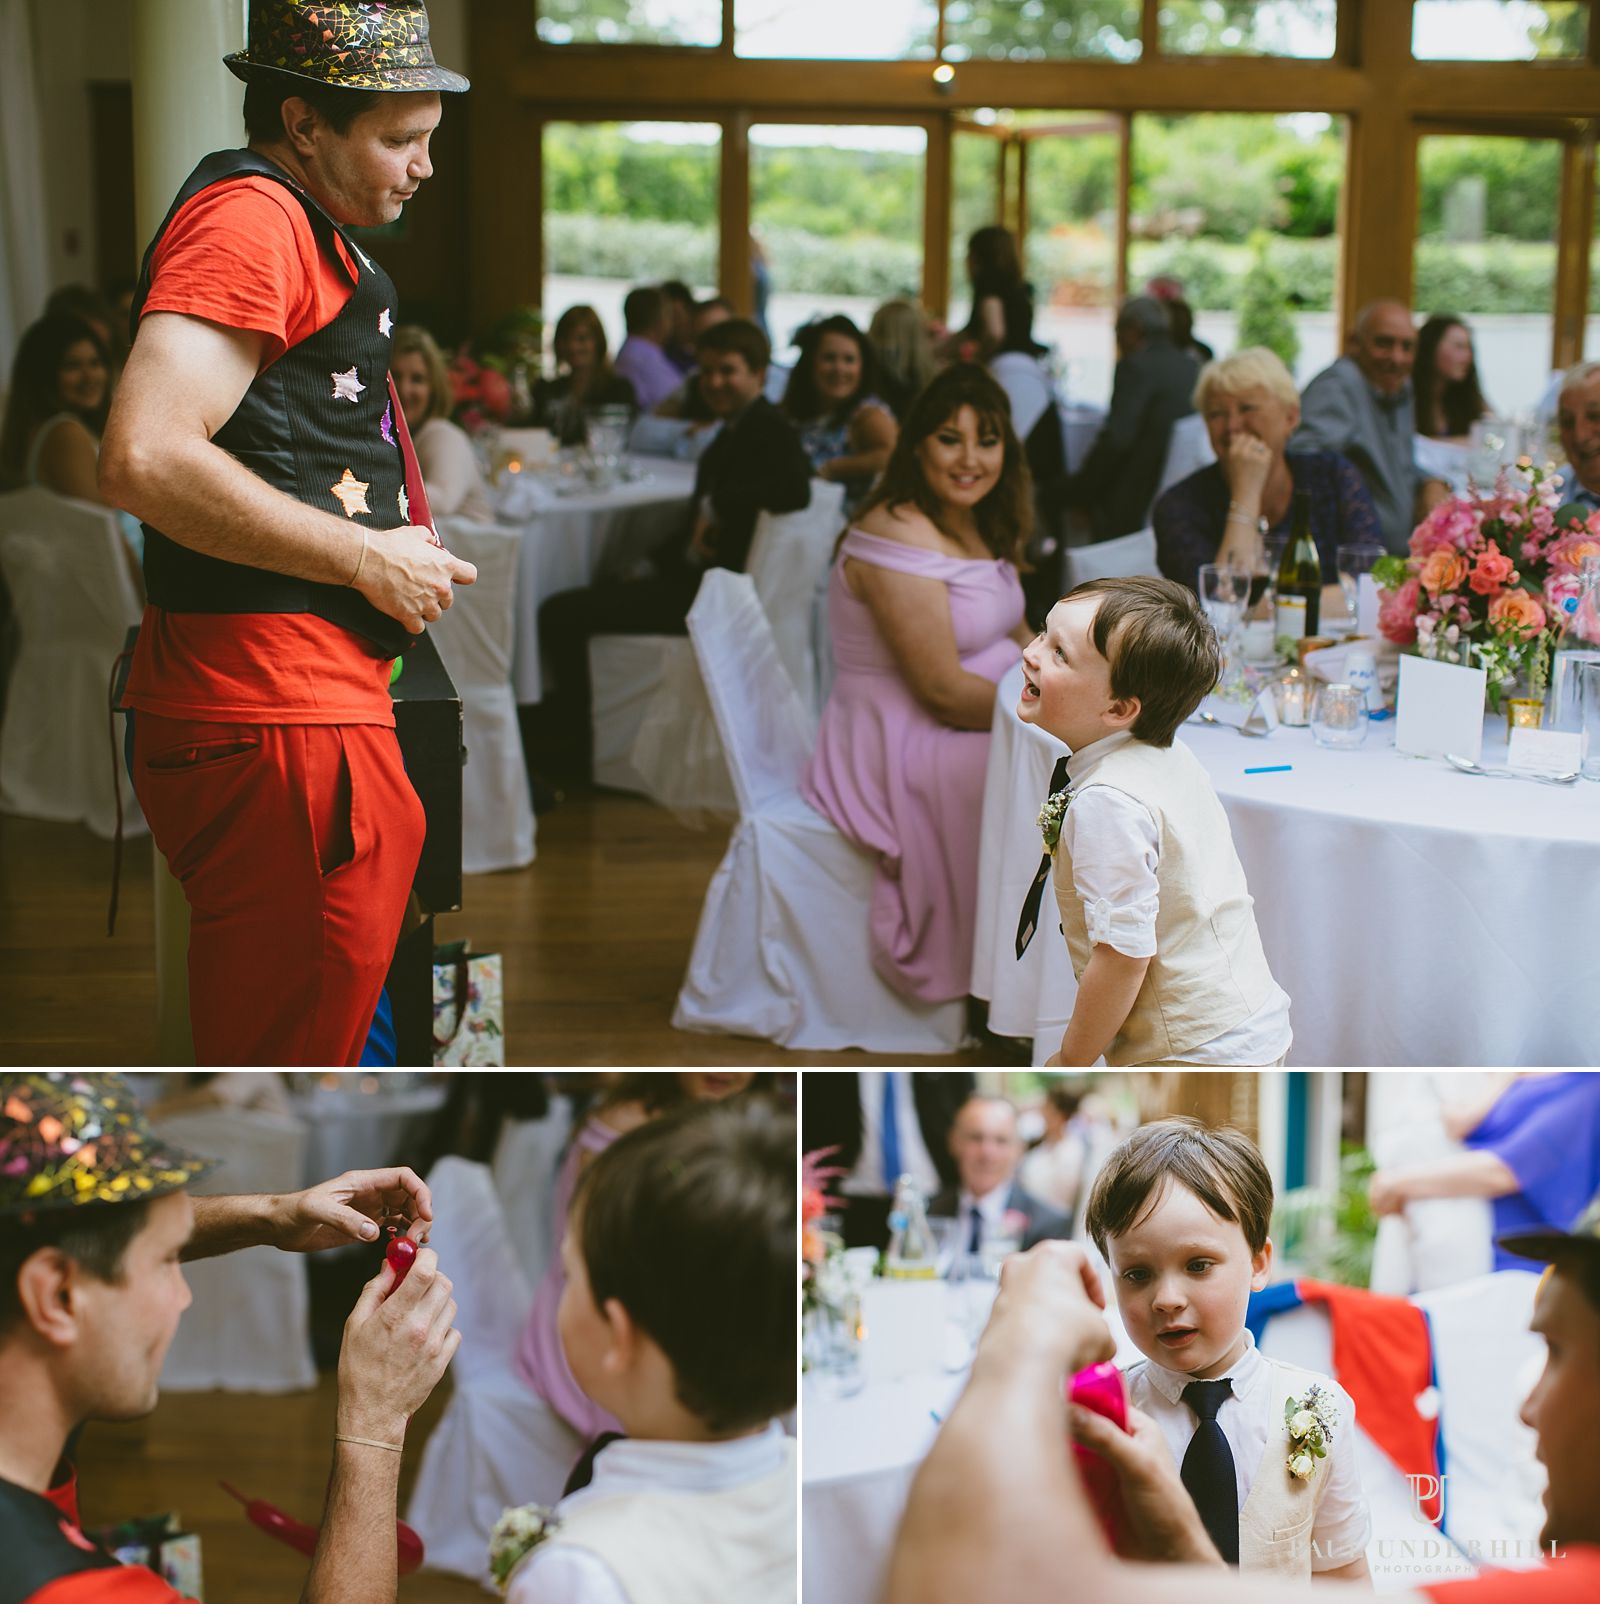 Magic Jack Magic at wedding